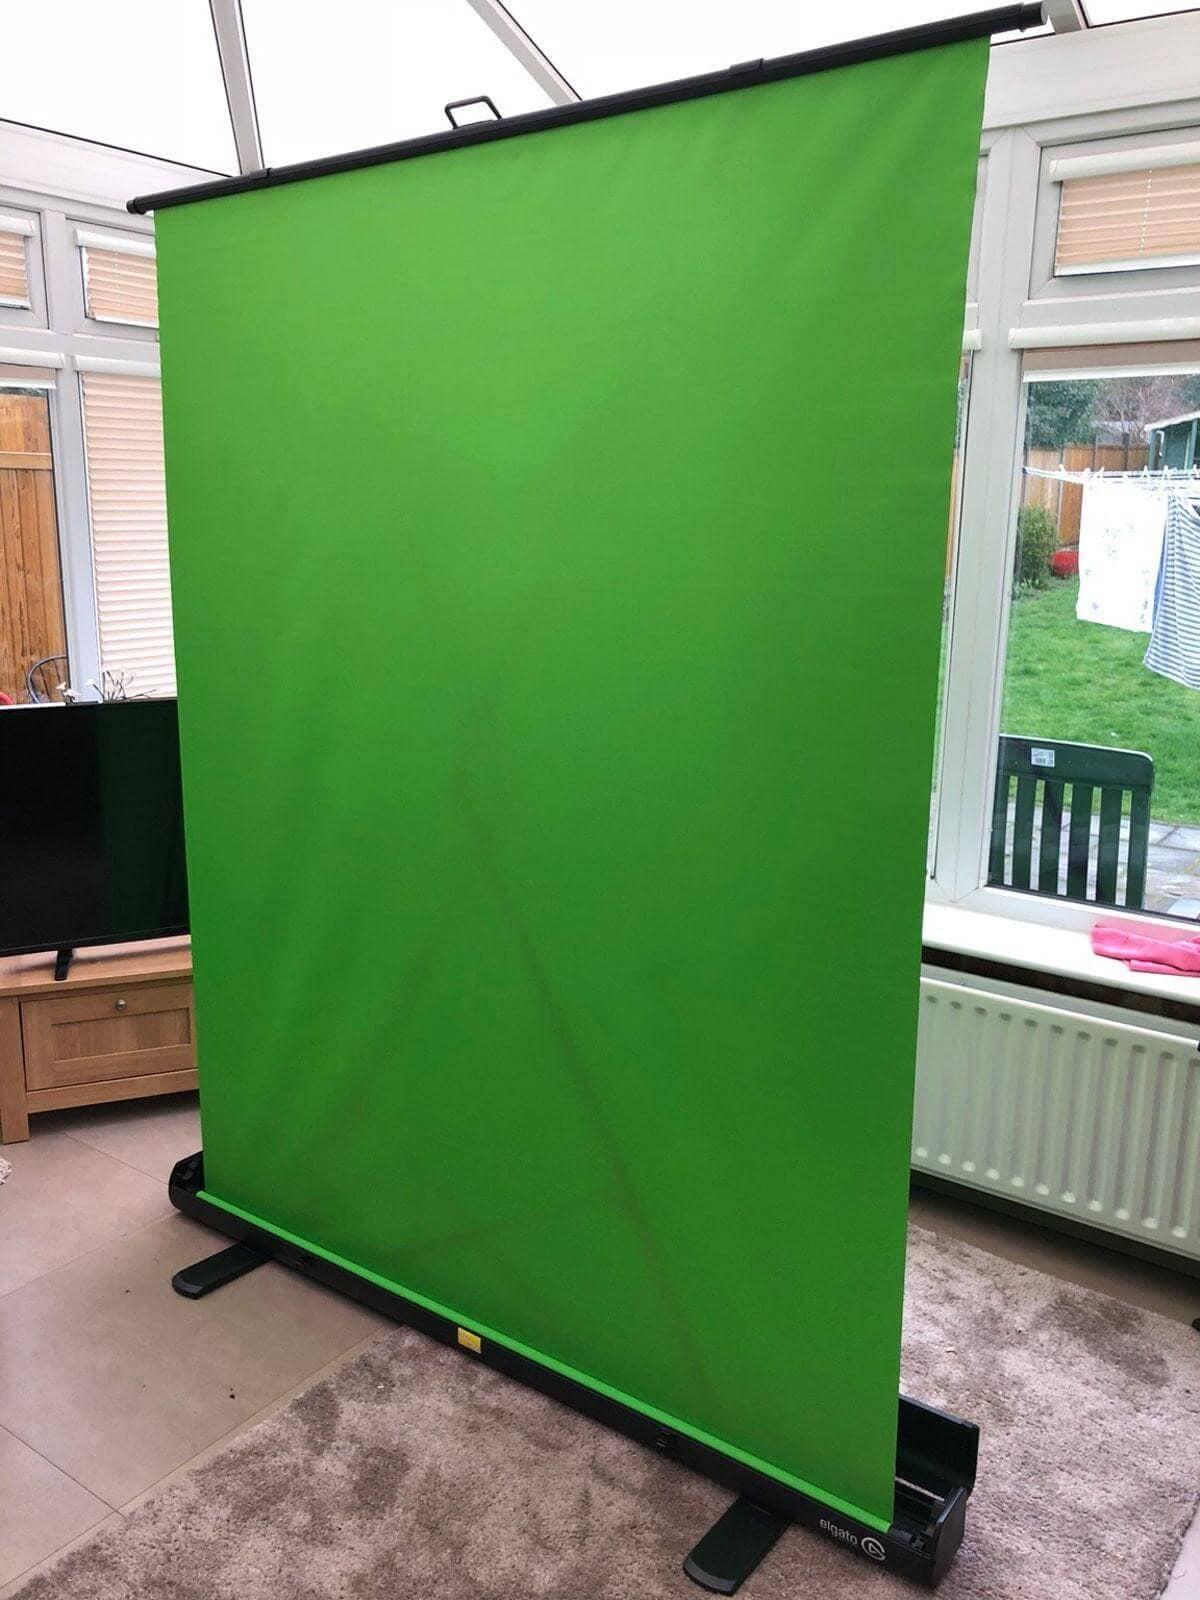 elgato green screen stand